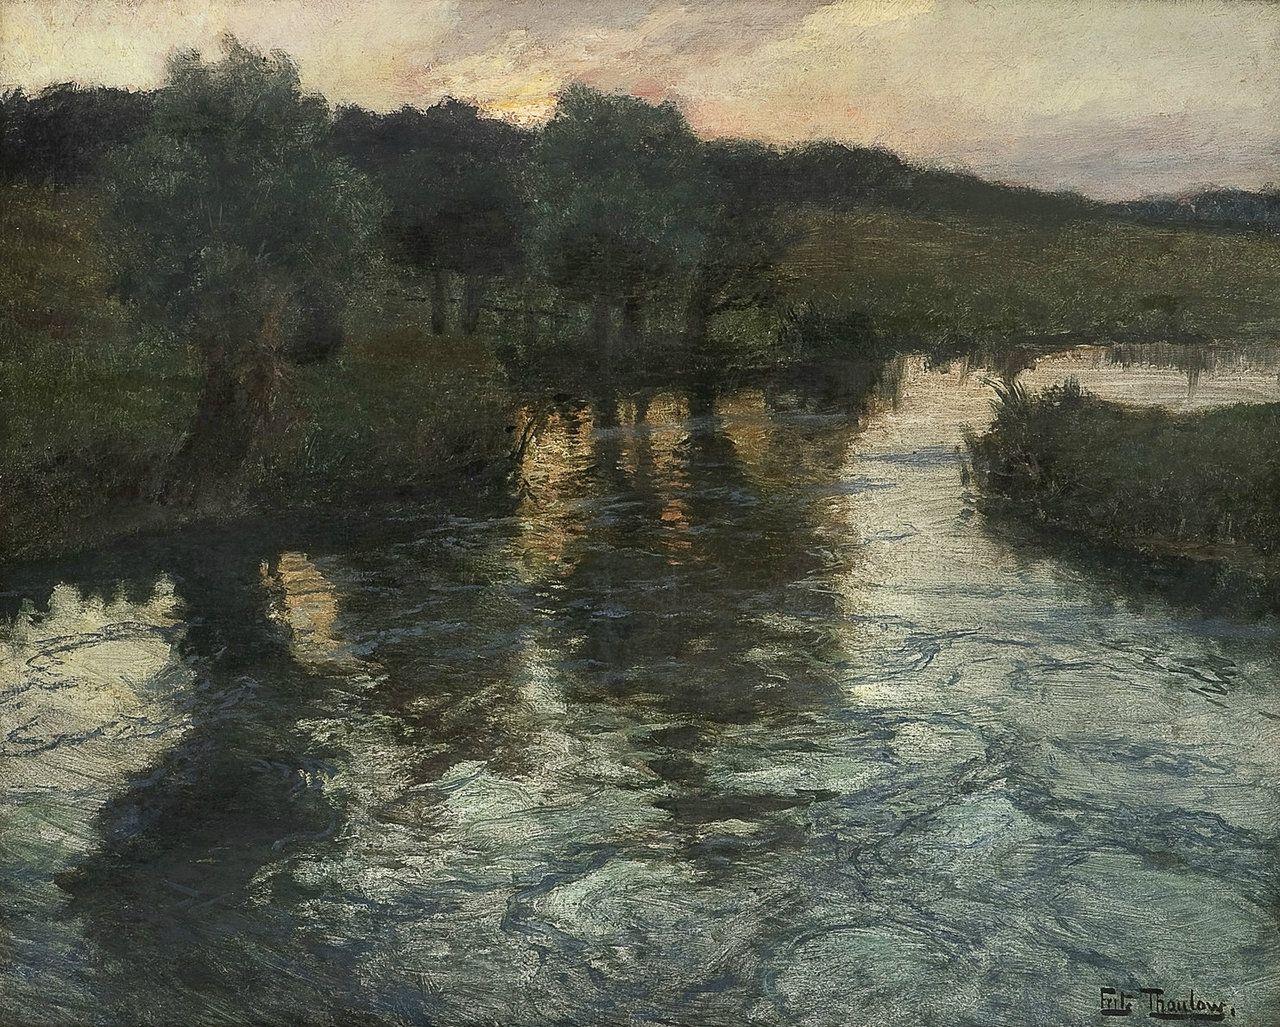 River Landscape Evening Frits Thaulow Norwegin Impressionist Painter 1847 1906 Paisaje Marino Paisajes Pinturas De Paisajes